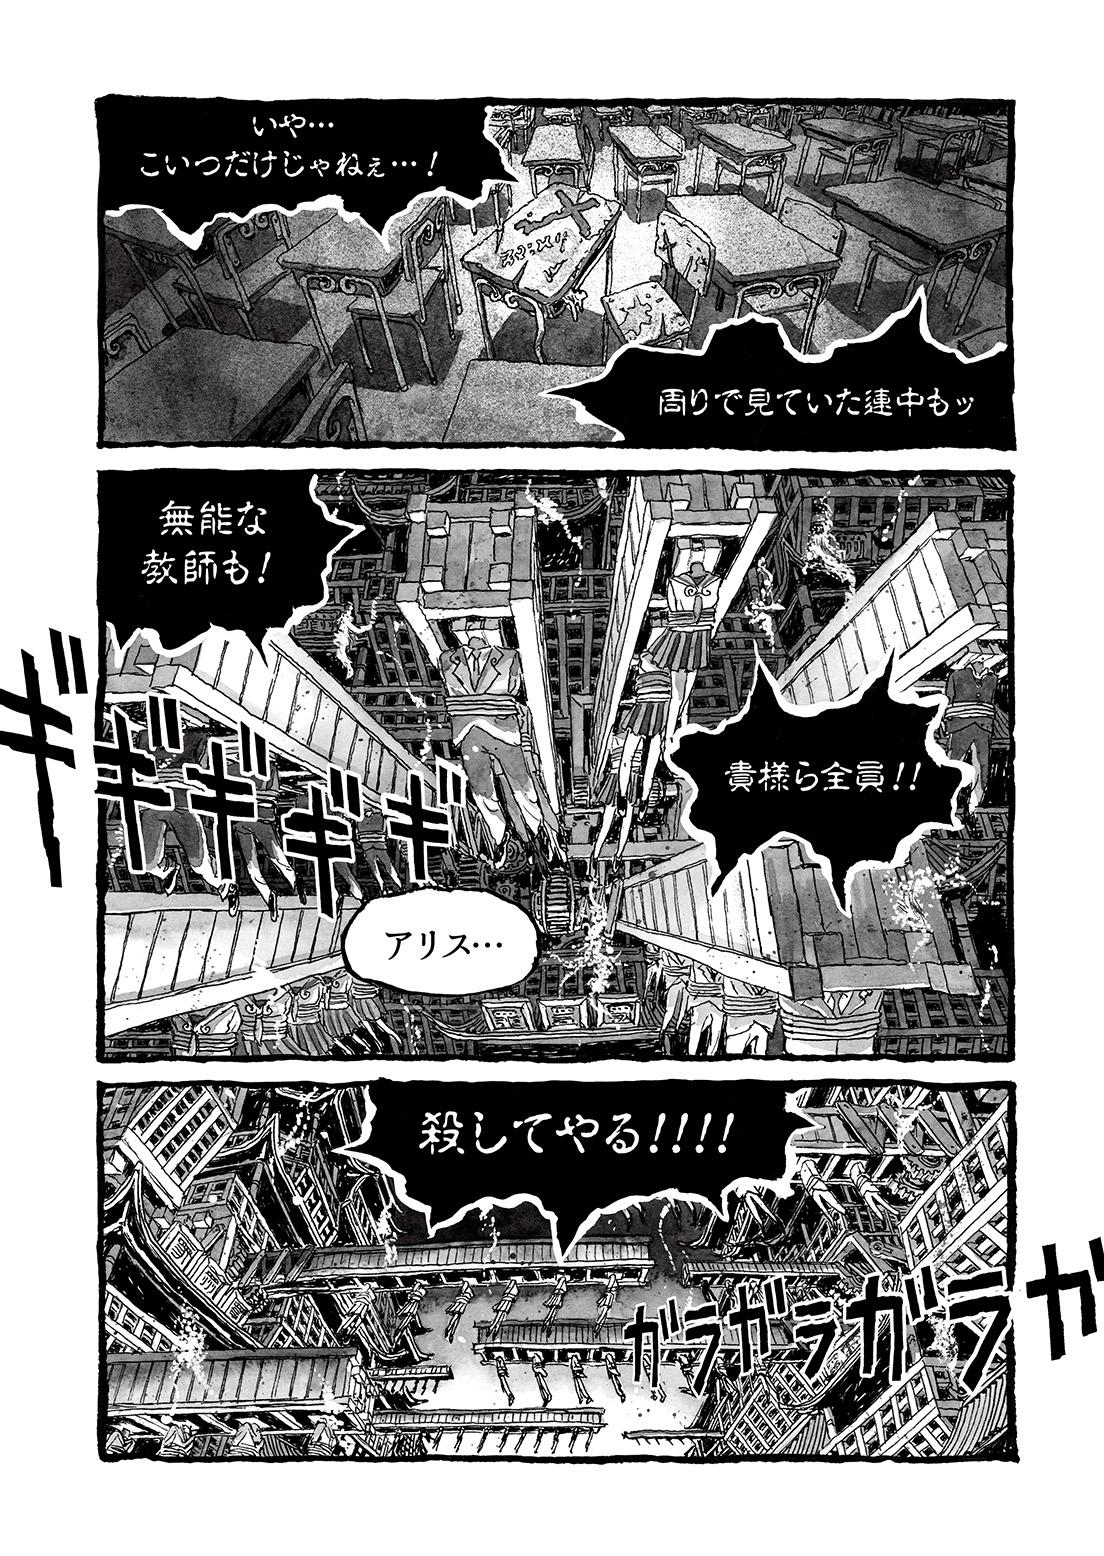 長編漫画「BIBLIOMANIA」連載 第2話「430号室の審判」15P